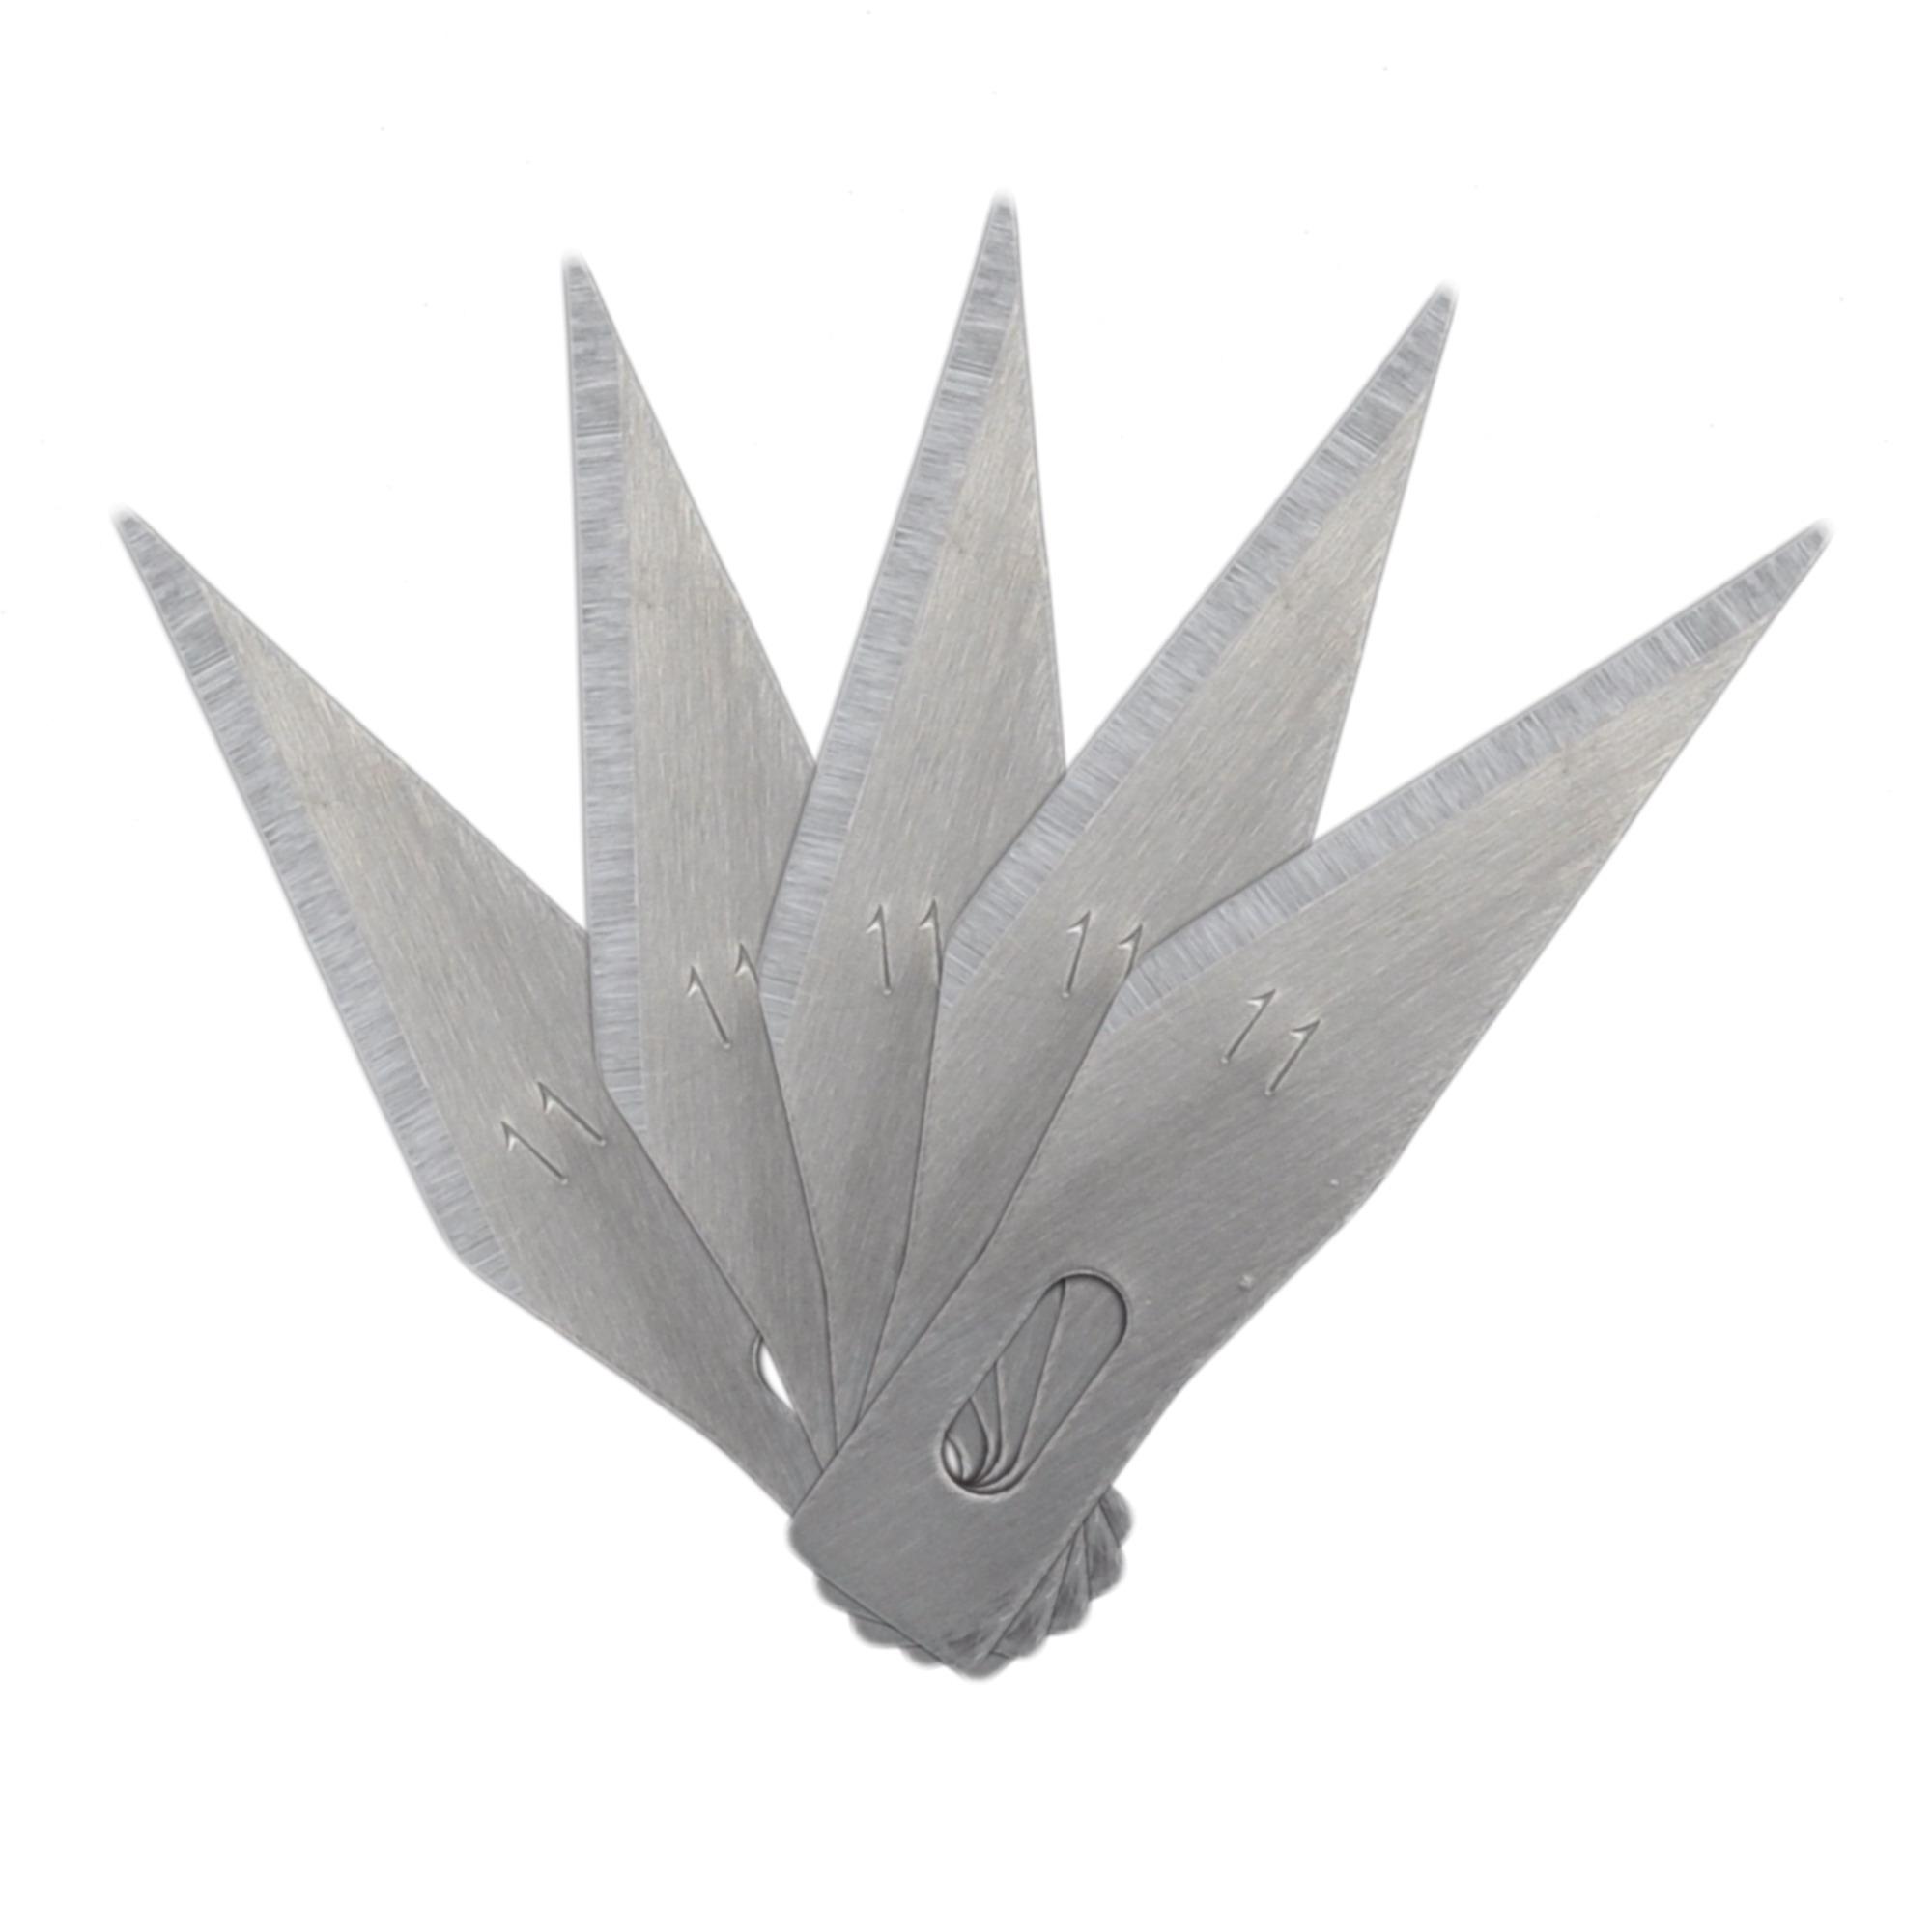 4 sets=20 pieces Blade Engraving DIY Hand Tools Mobil Phone Repair Knife Wood Paper Cutter Craft Pen Knives[4PCS/Lot](China (Mainland))